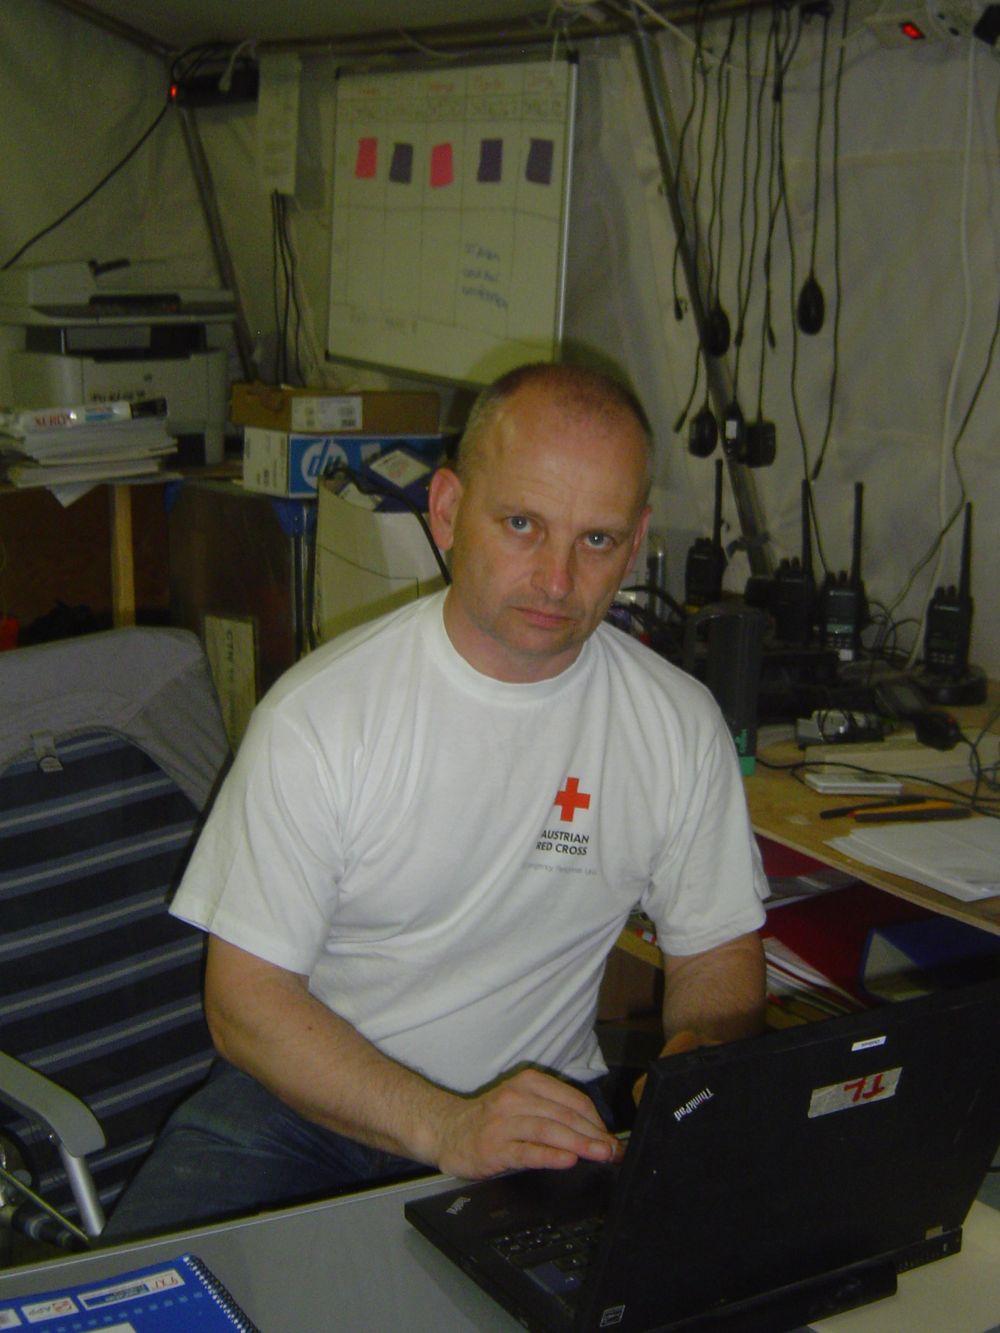 Teamleader Andreas Hattinger